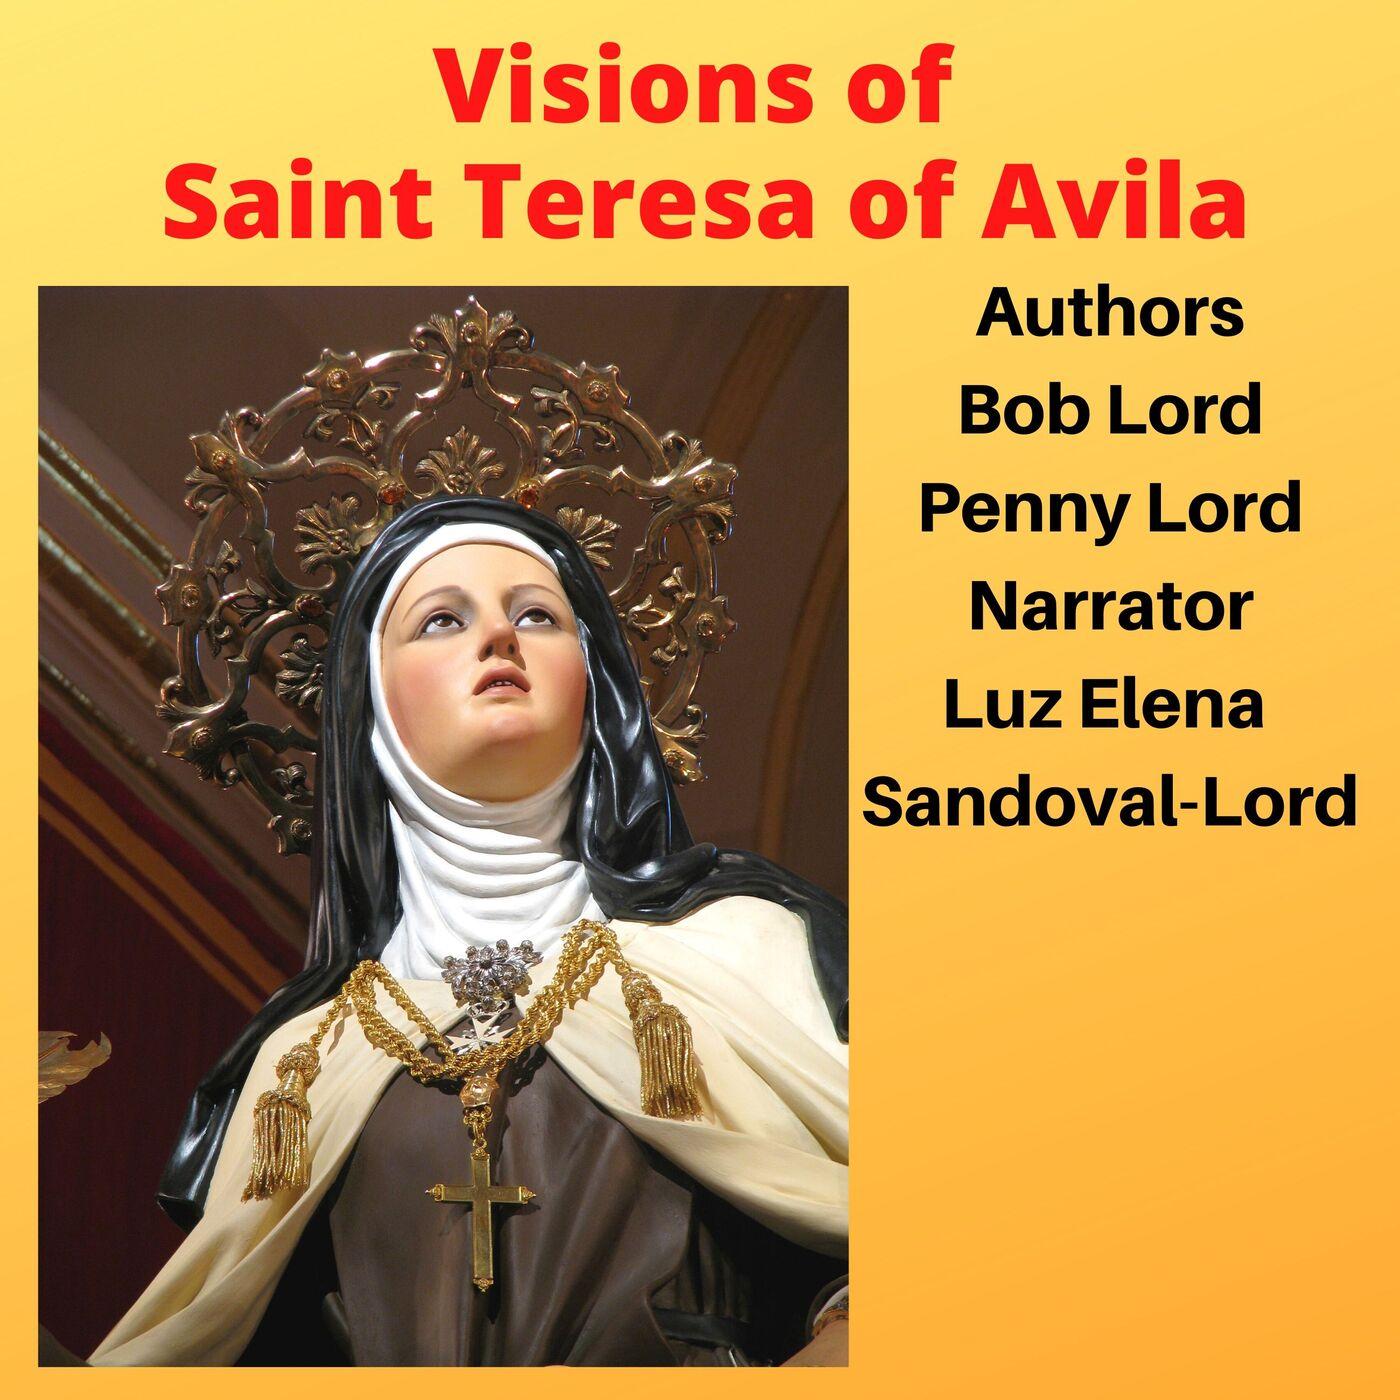 Visions of Saint Teresa of Avila Feast Day October 15